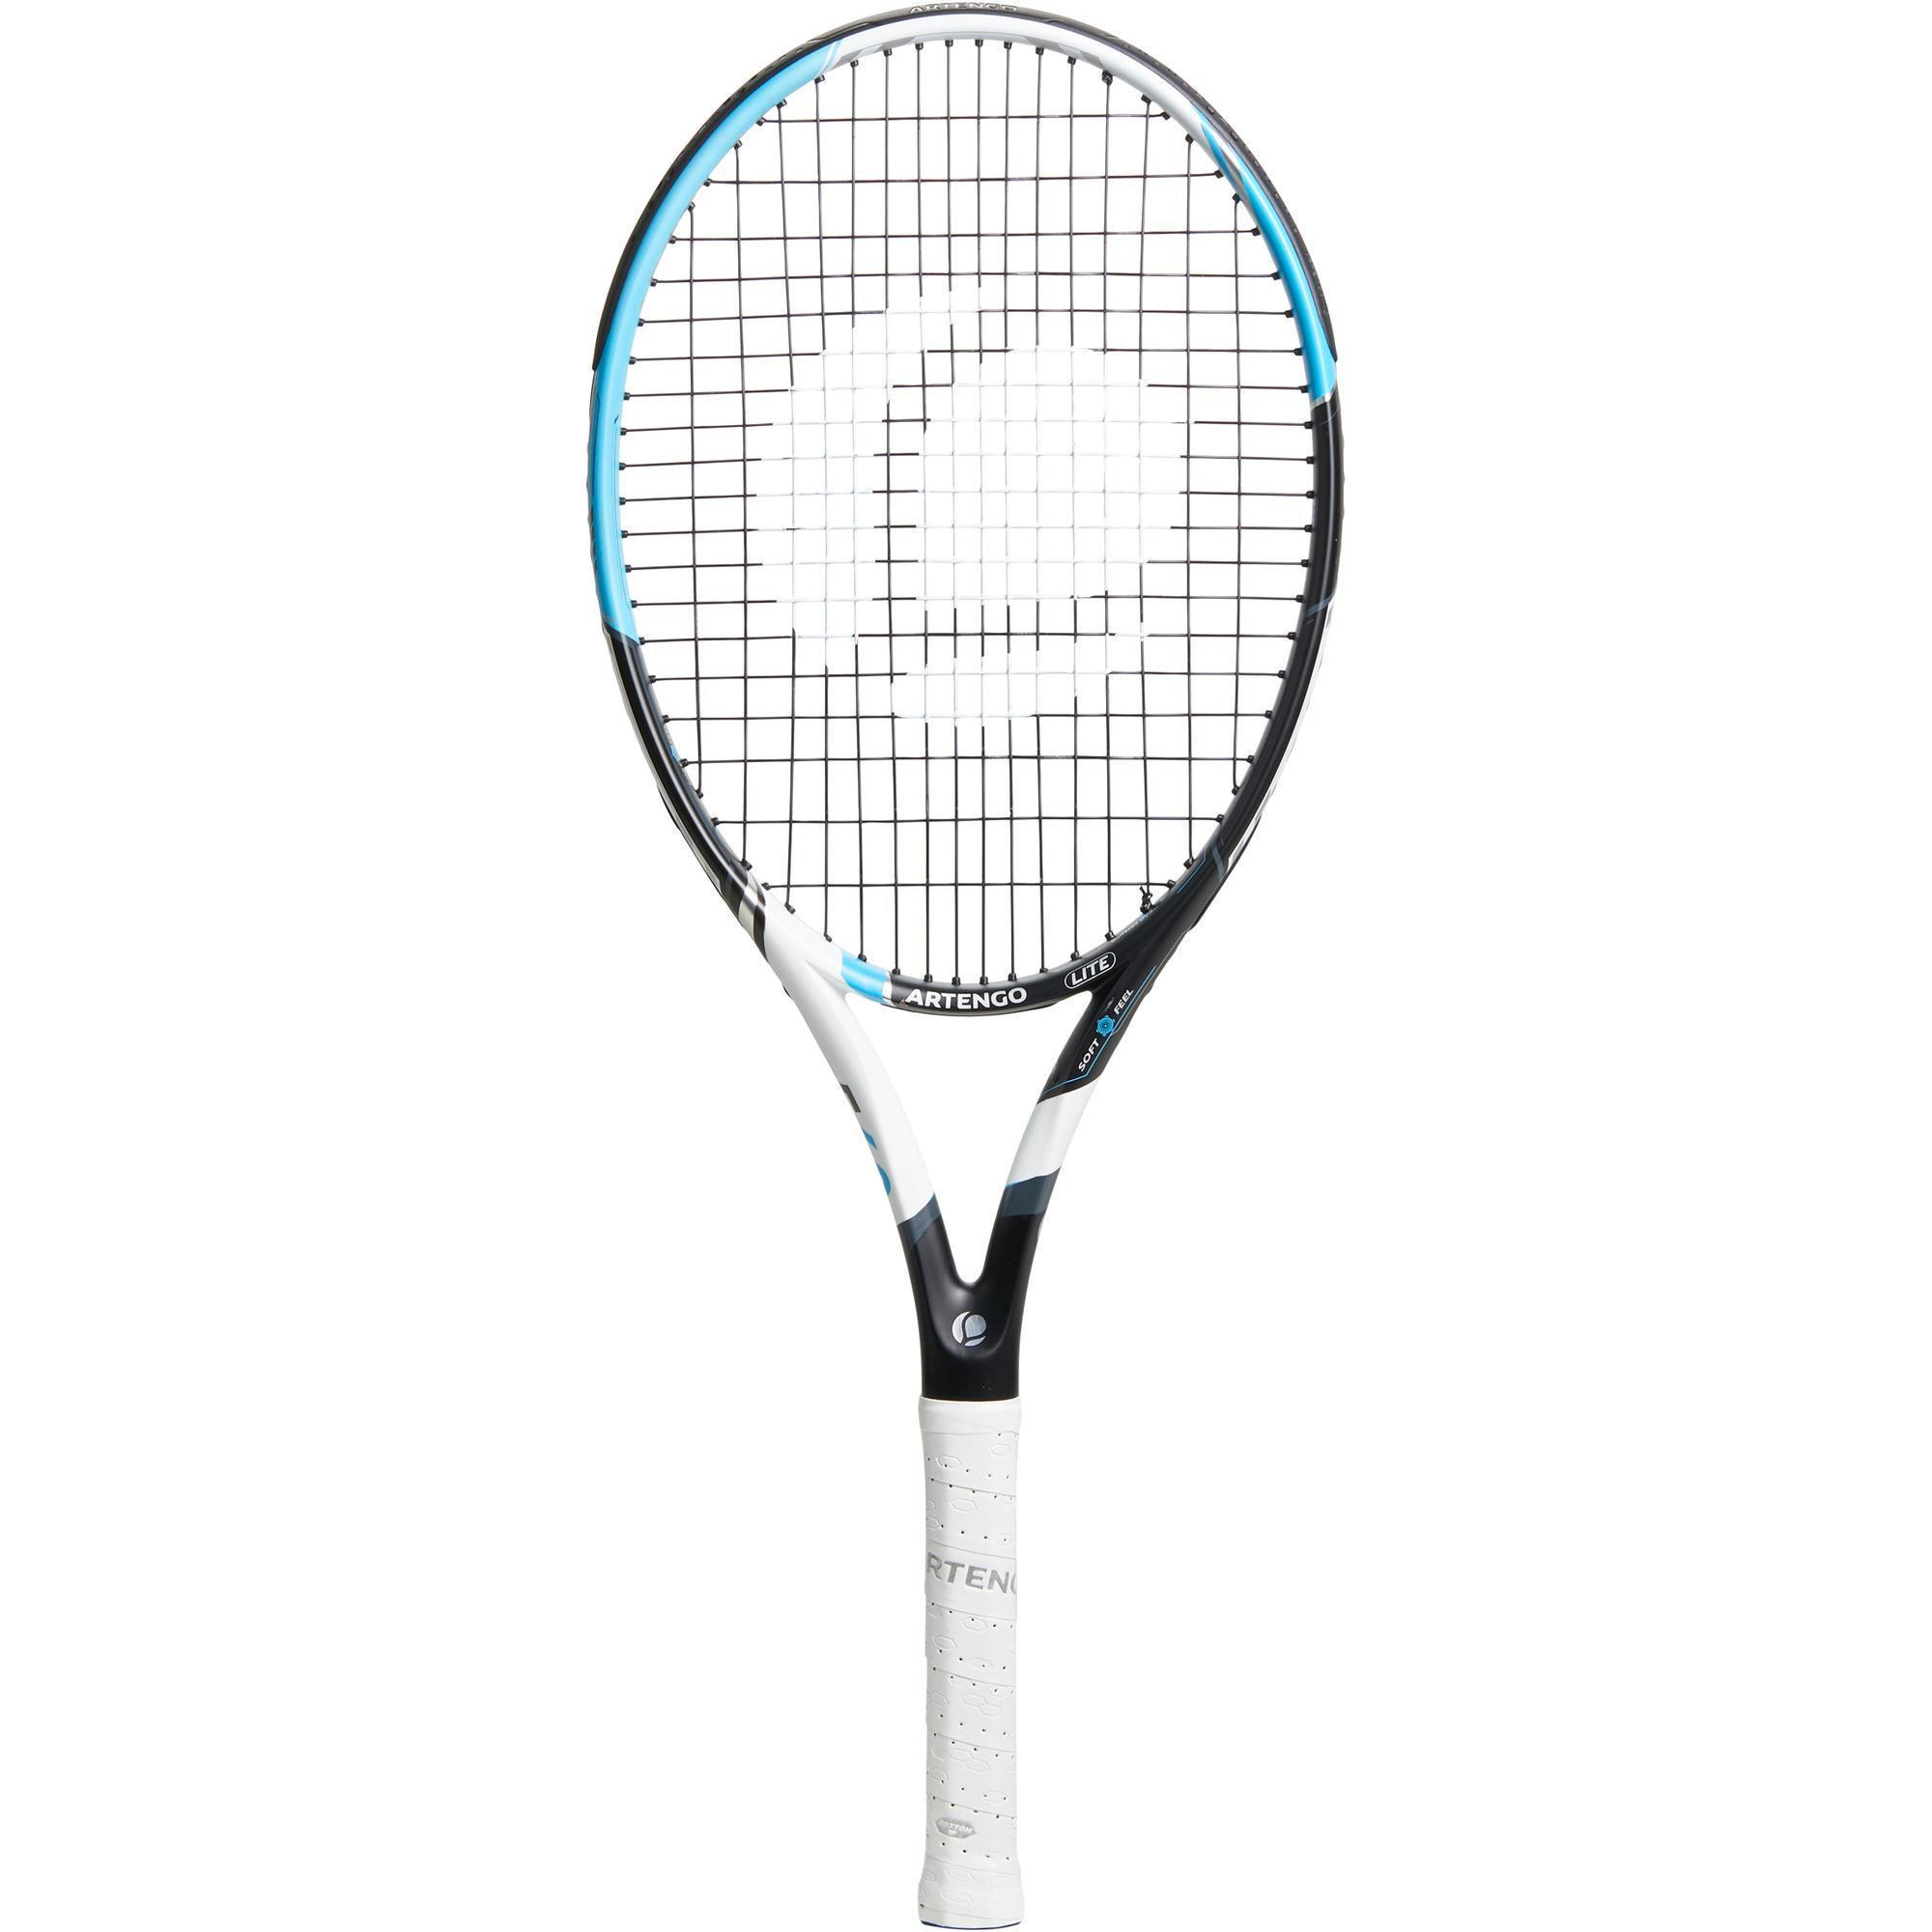 Raquette de tennis adulte artengo tr560 lite noir bleu blanc artengo - Raquette de tennis de table decathlon ...